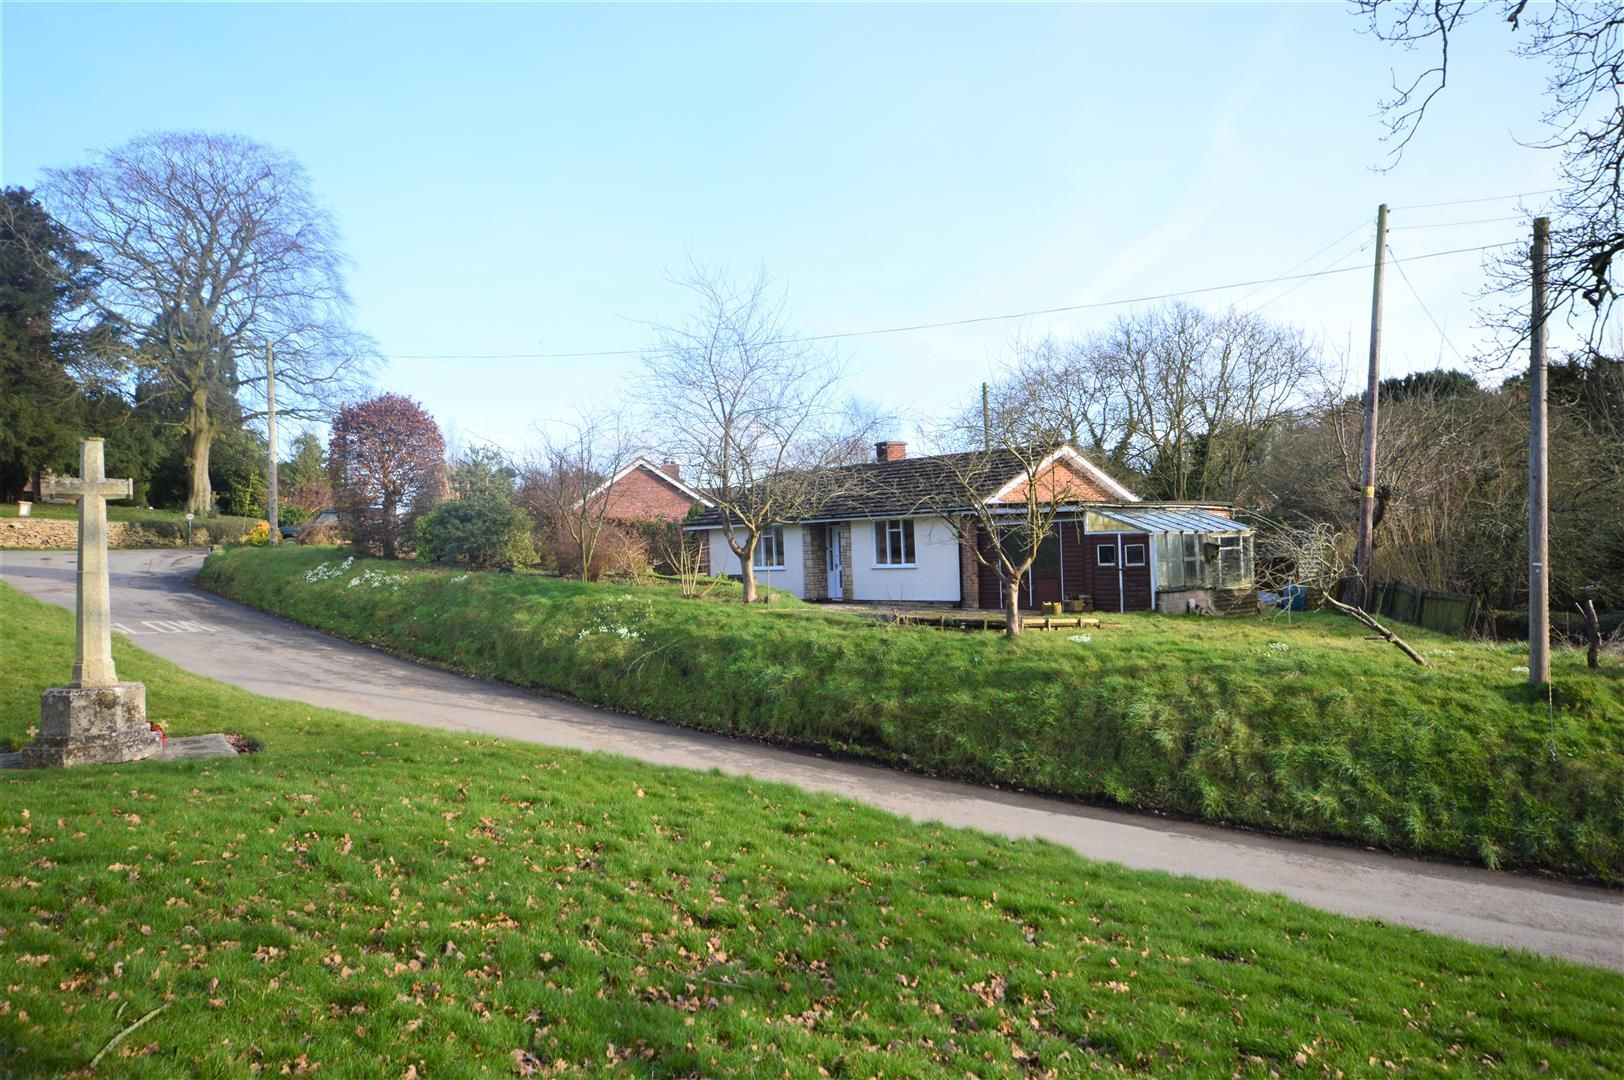 2 bed detached-bungalow for sale in Bromyard, HR7